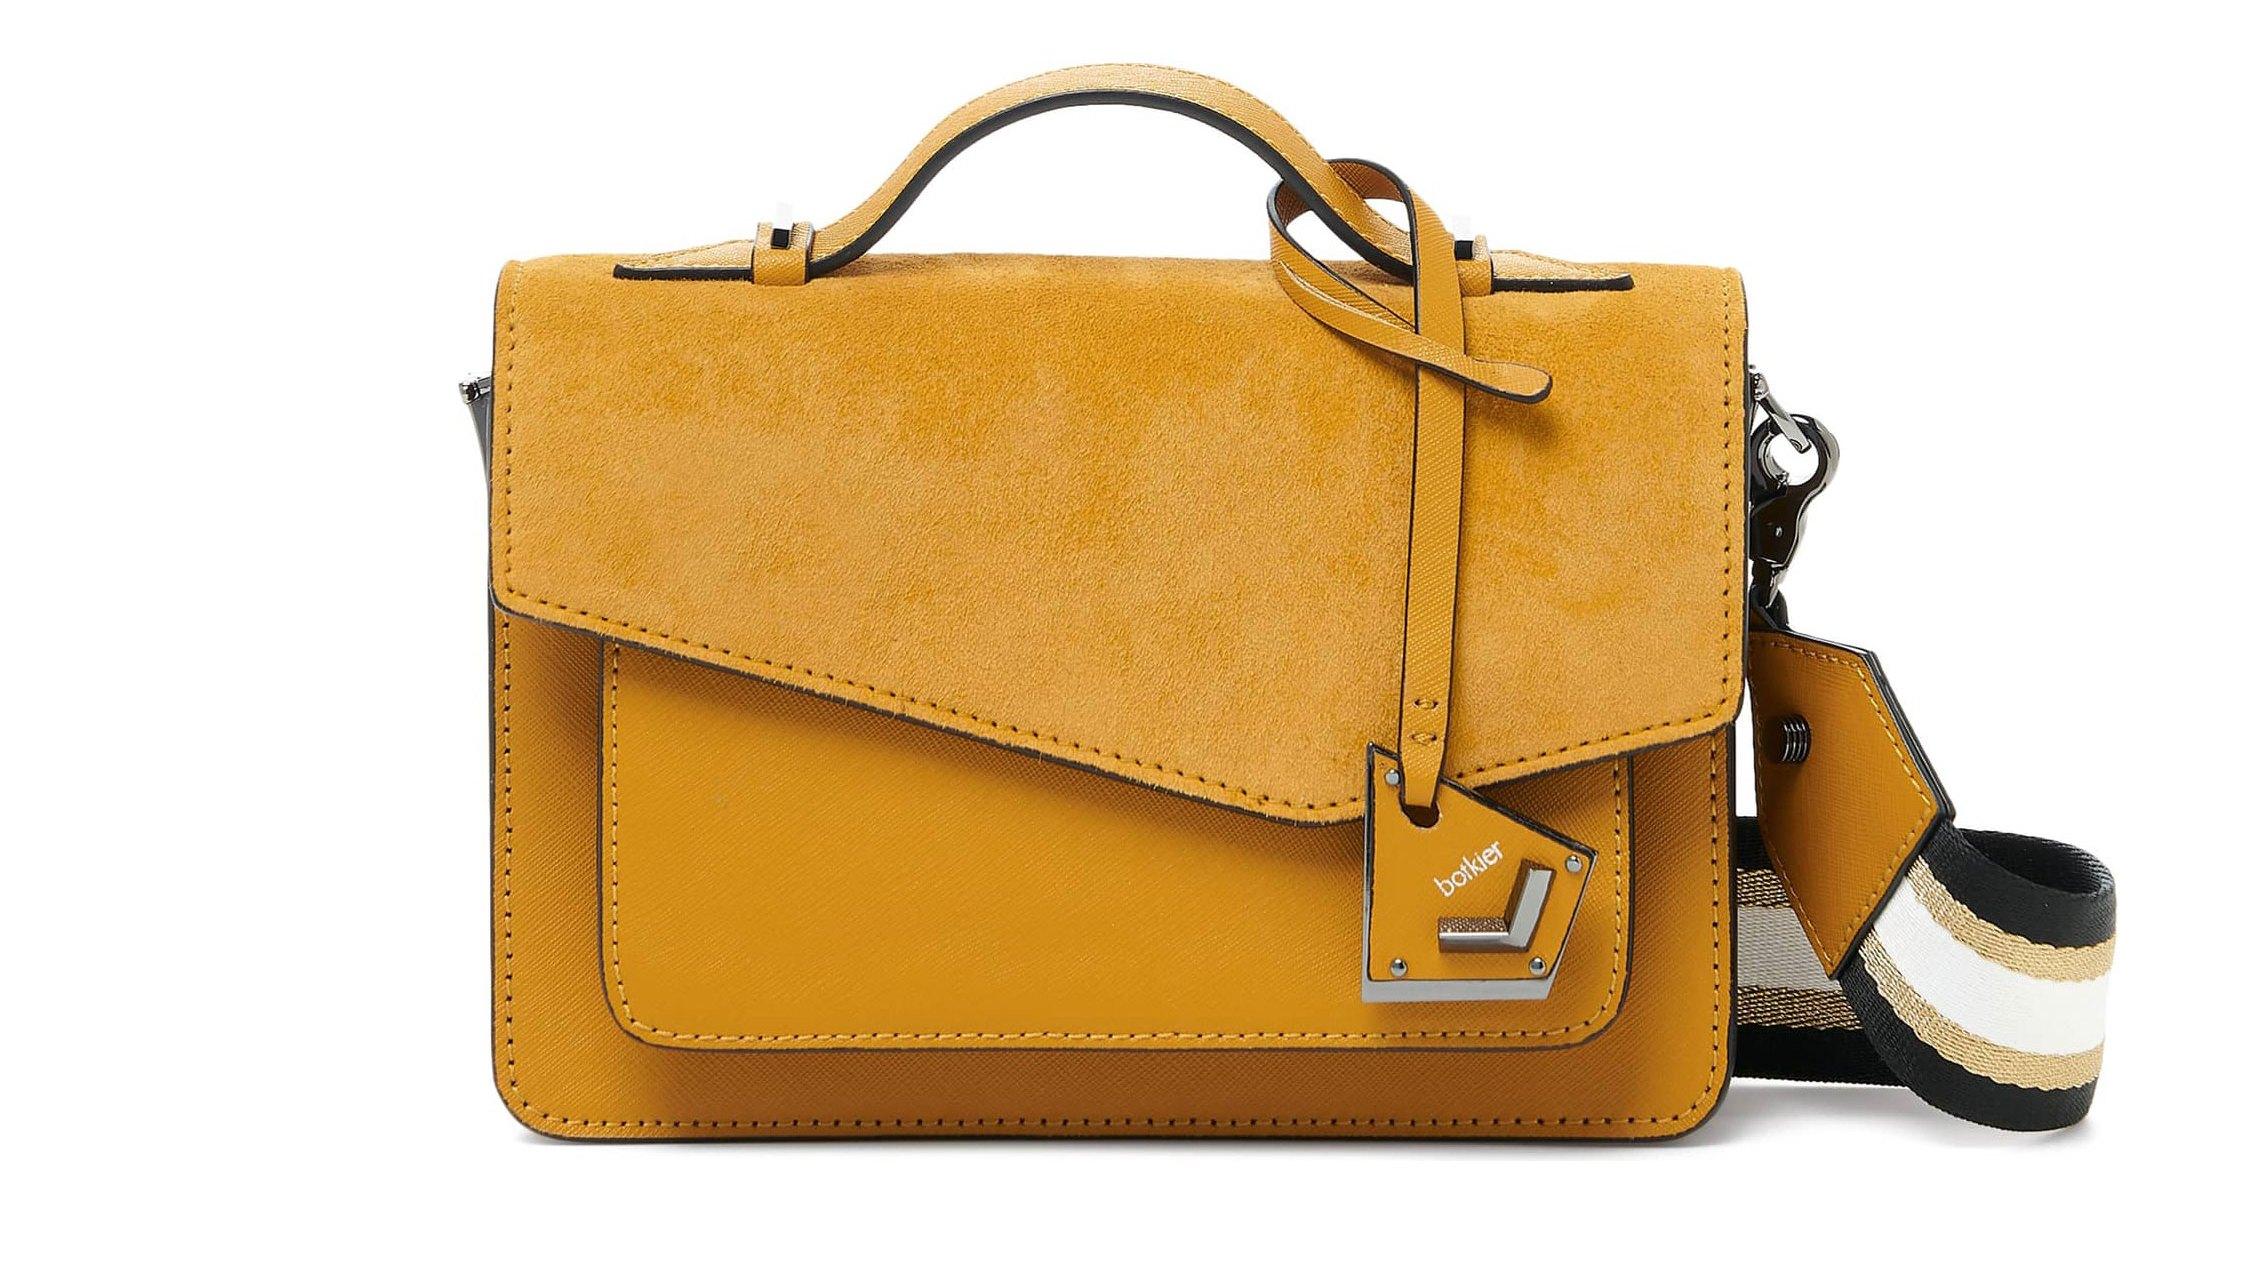 Botkier-Cobble-Hill-Calfskin-Leather-Cross-Body-Bag